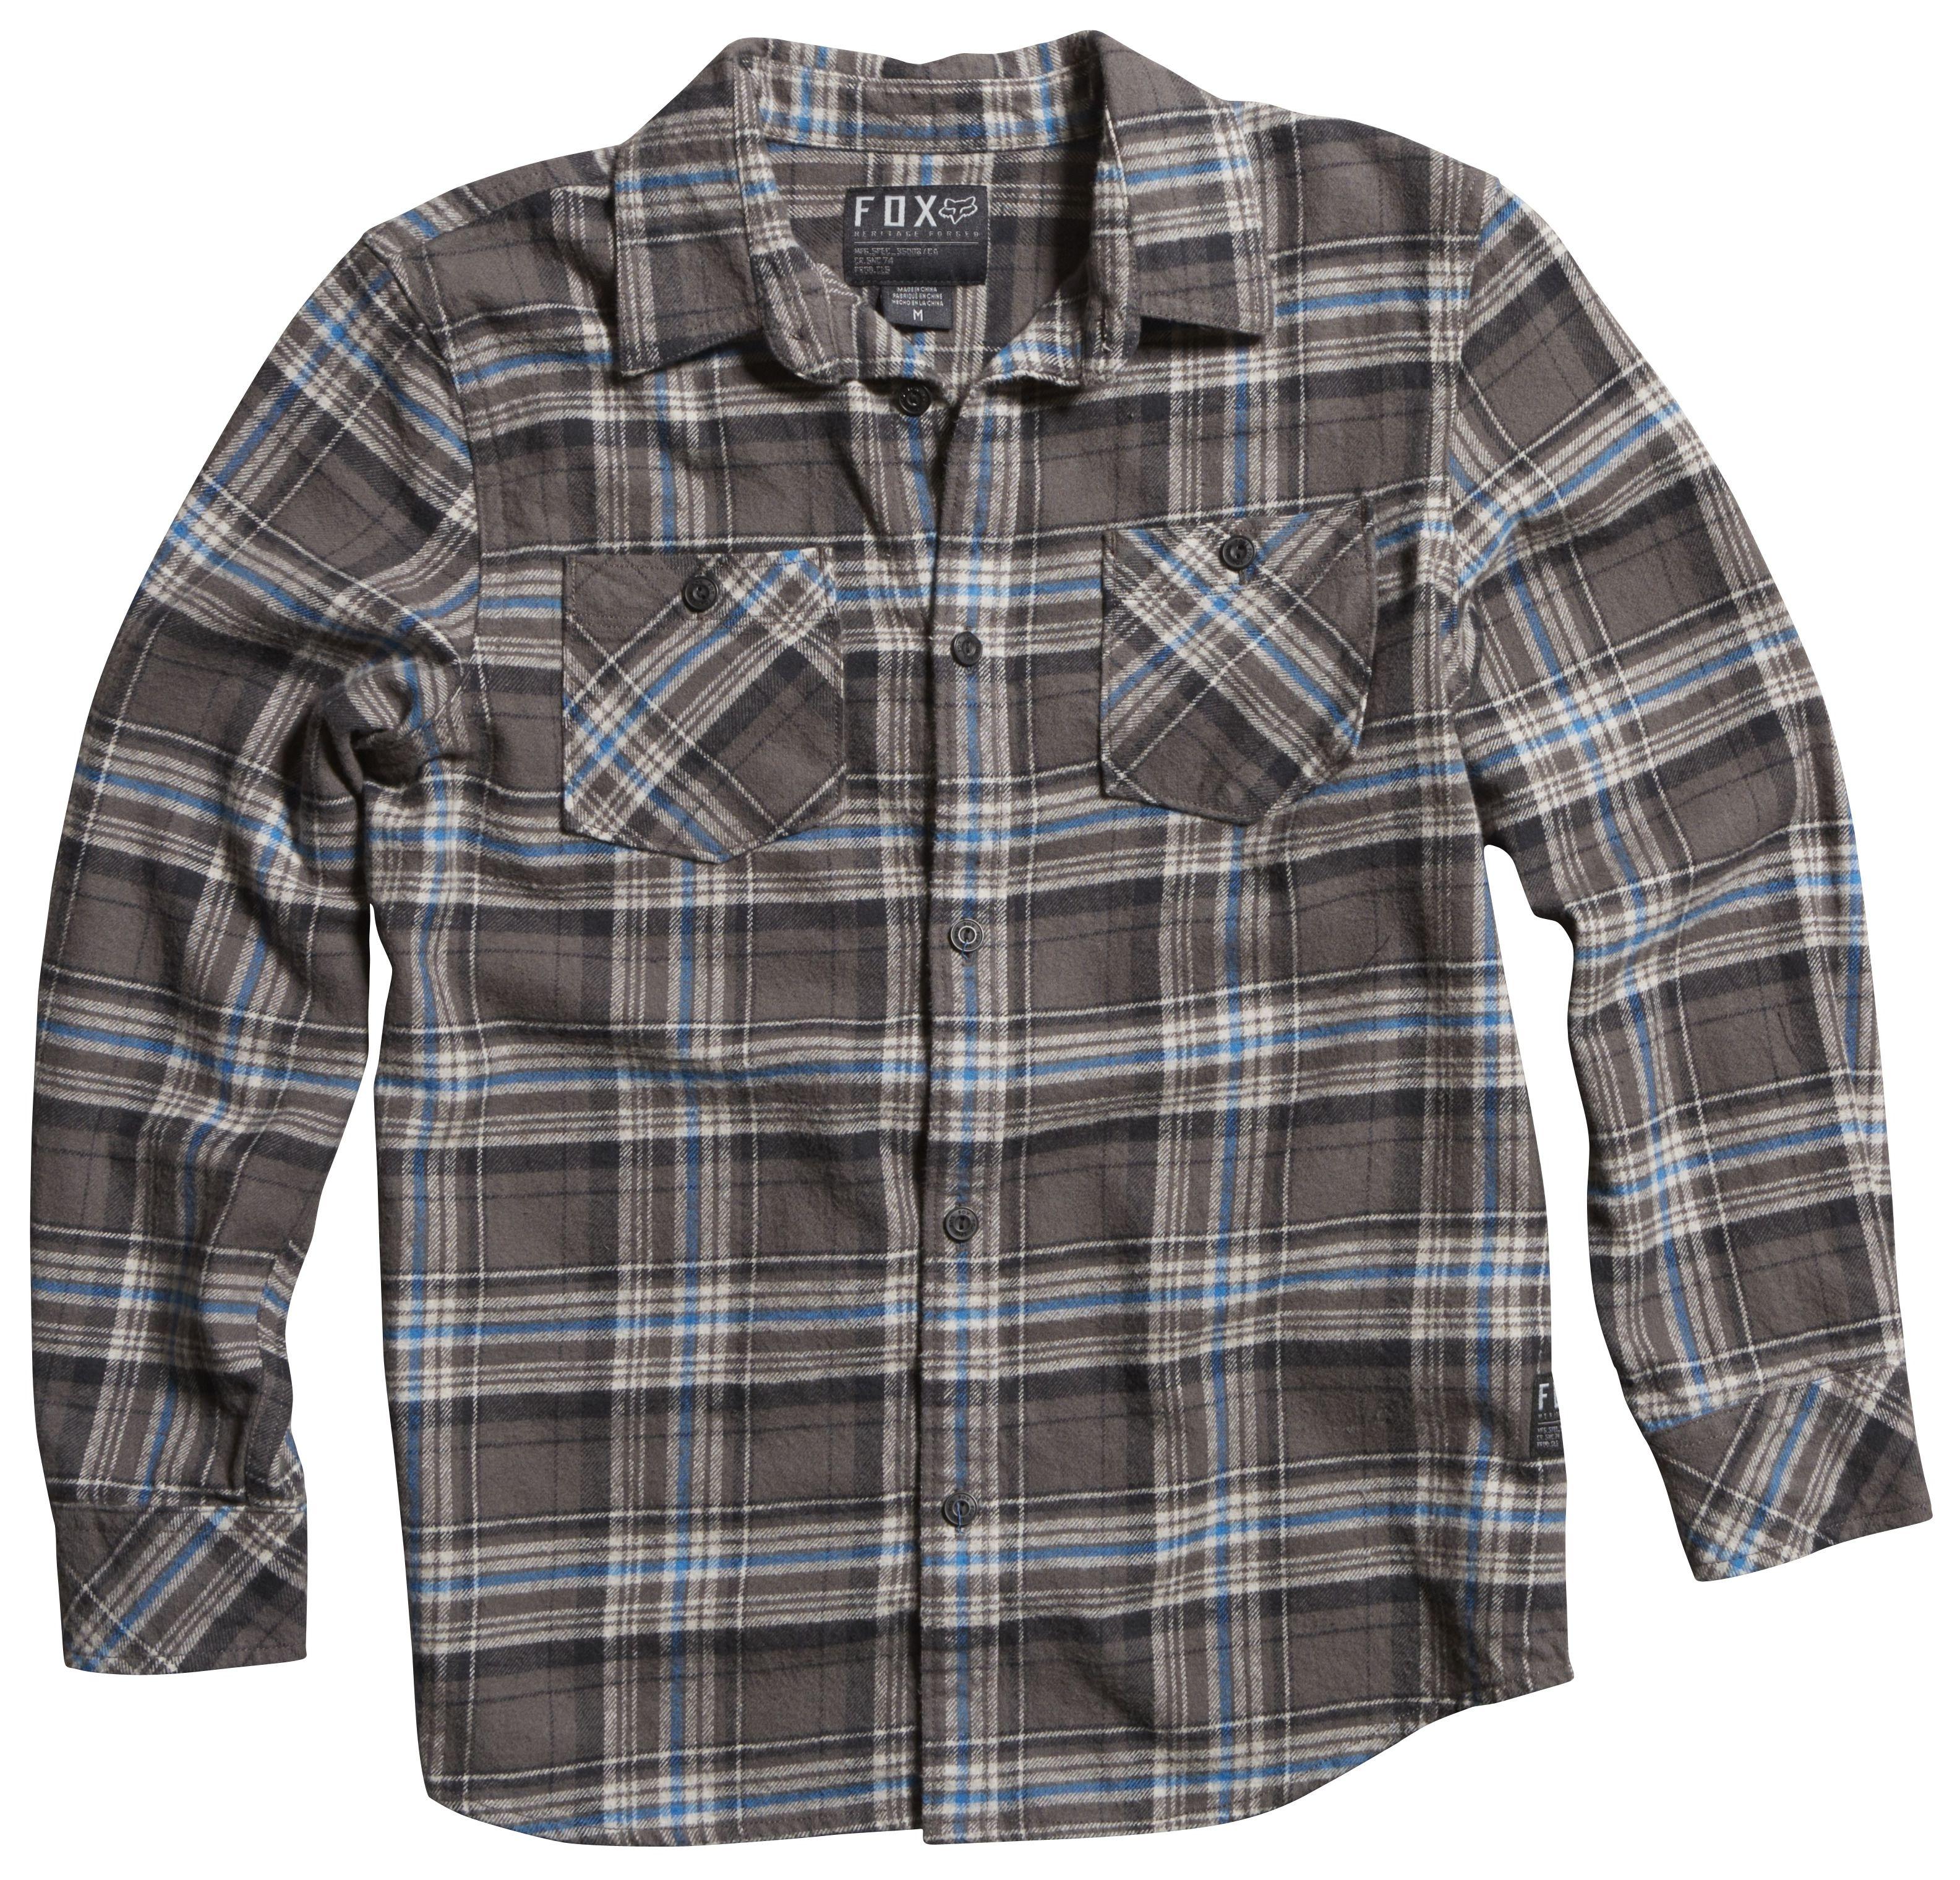 Fox Racing Youth Nico Flannel Shirt Revzilla